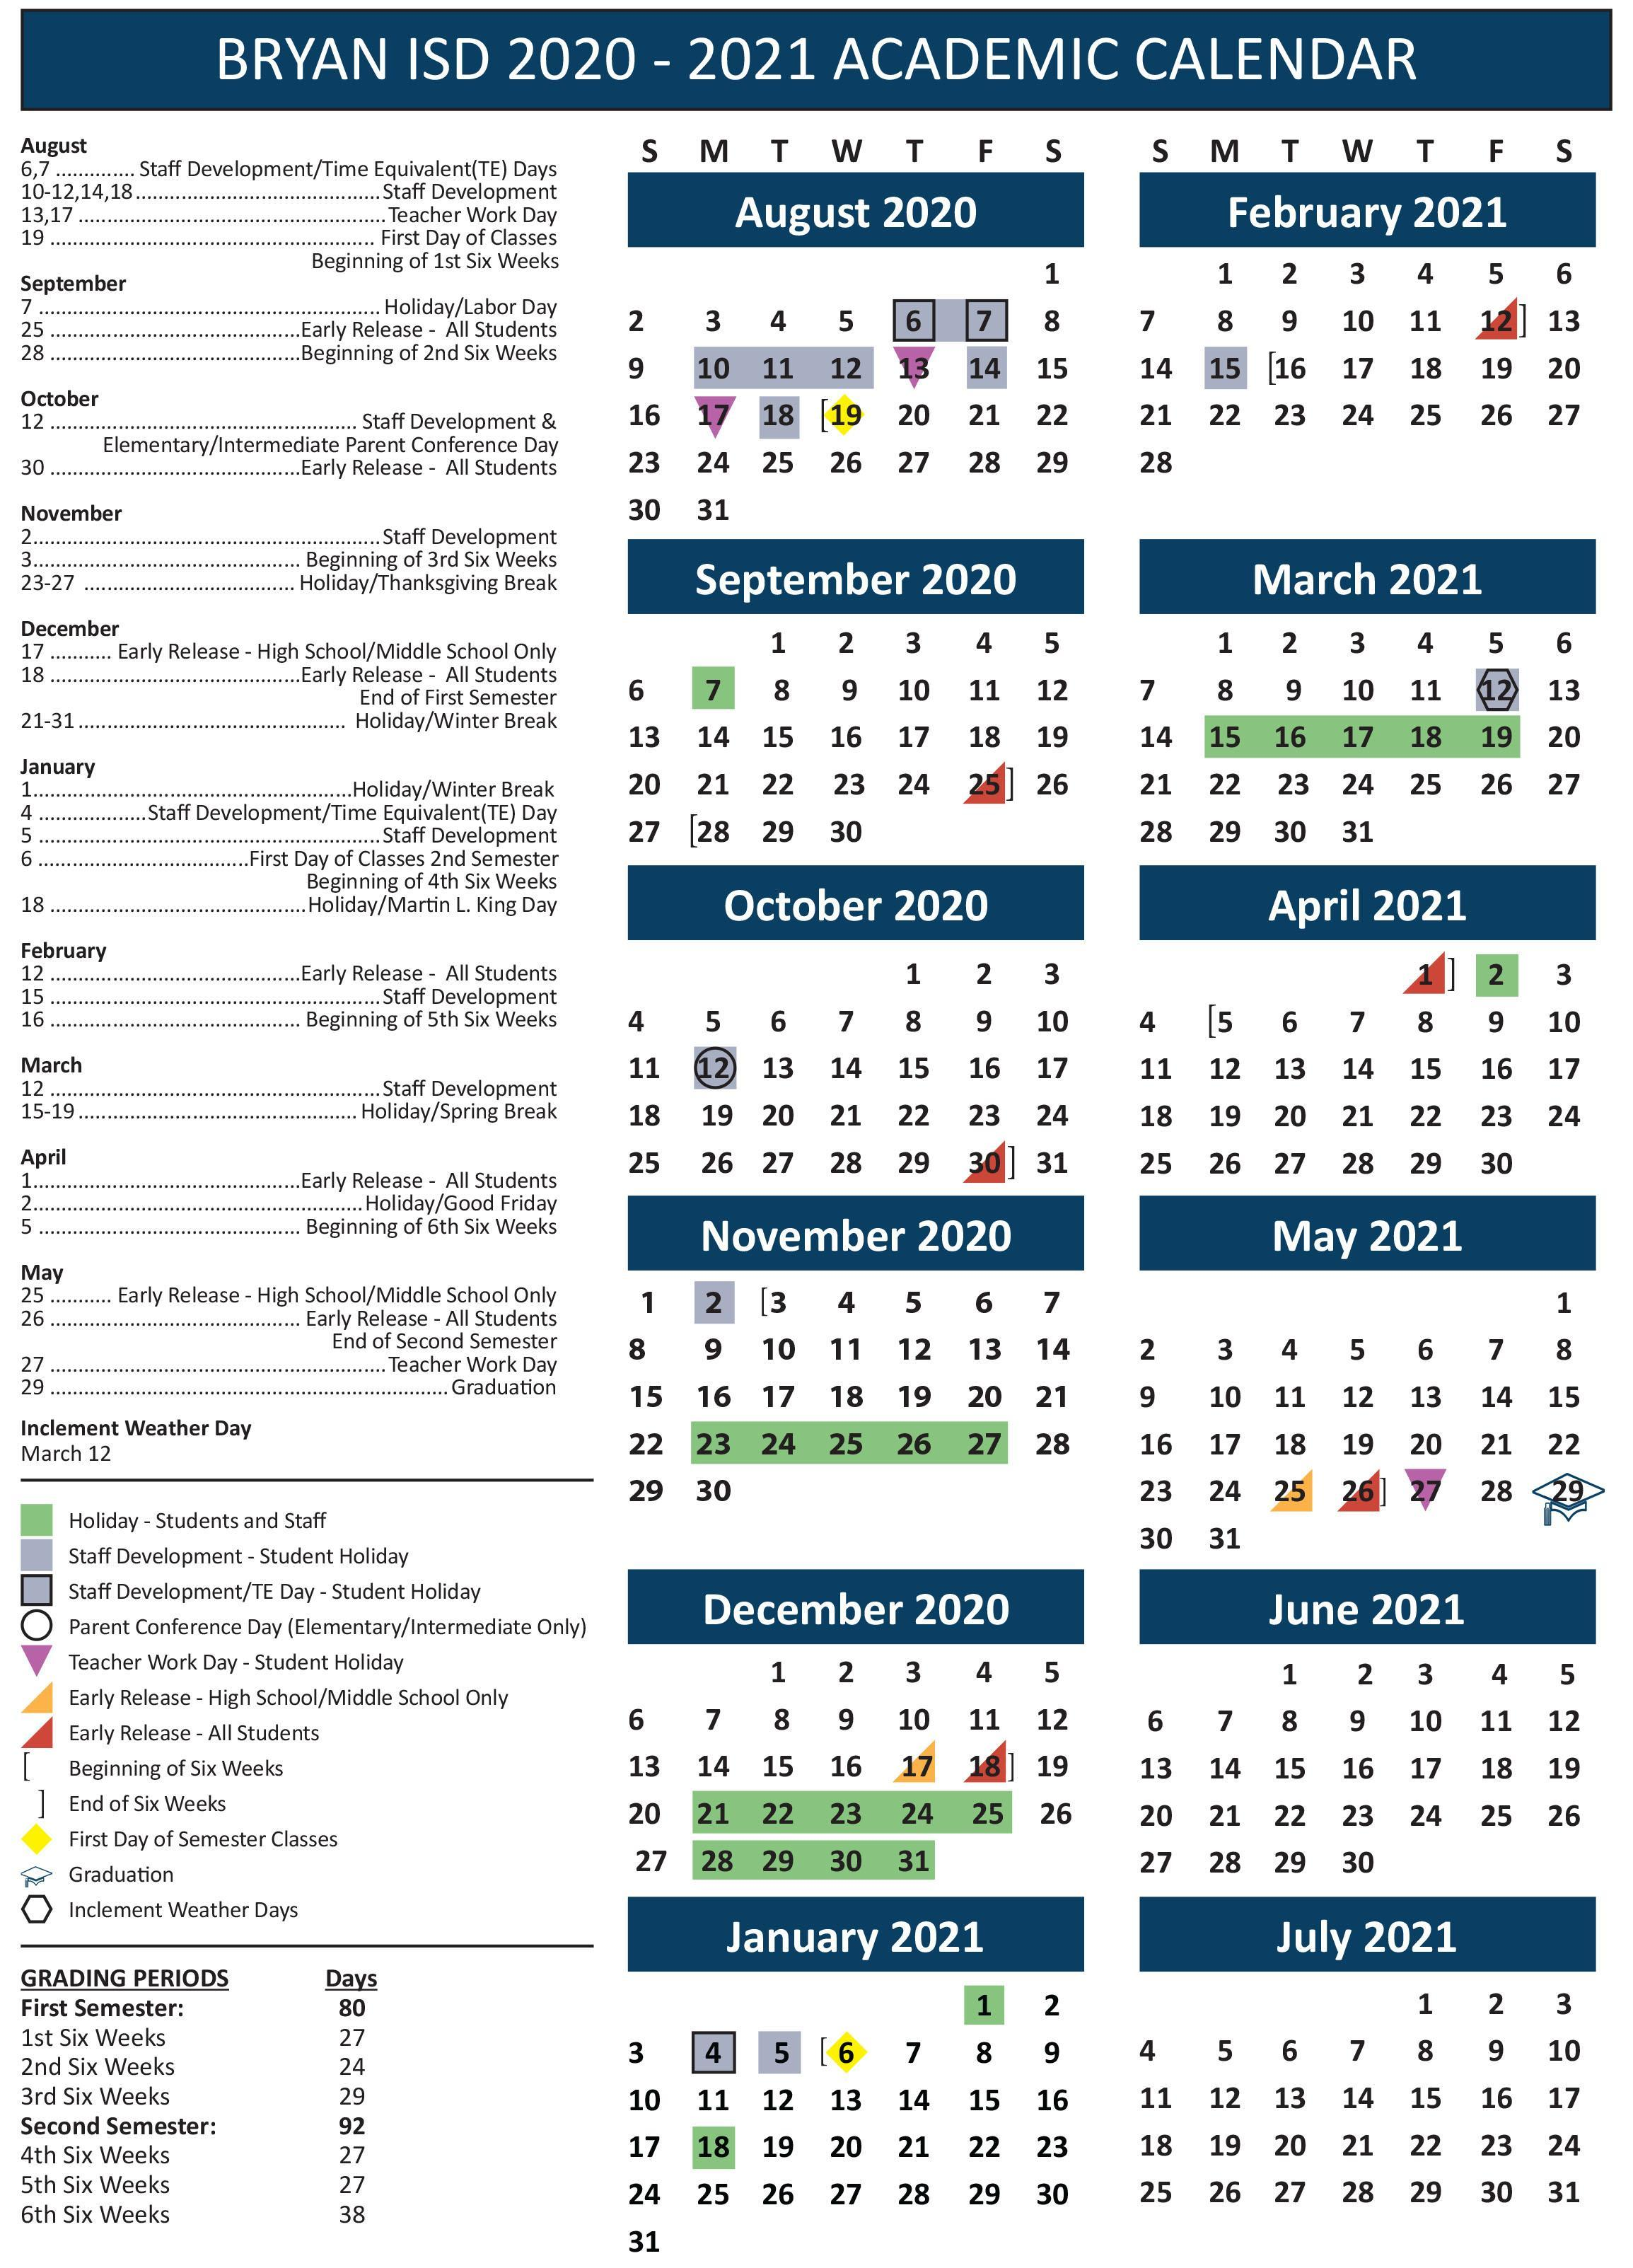 2020 2021 Academic Calendar for Bryan Schools